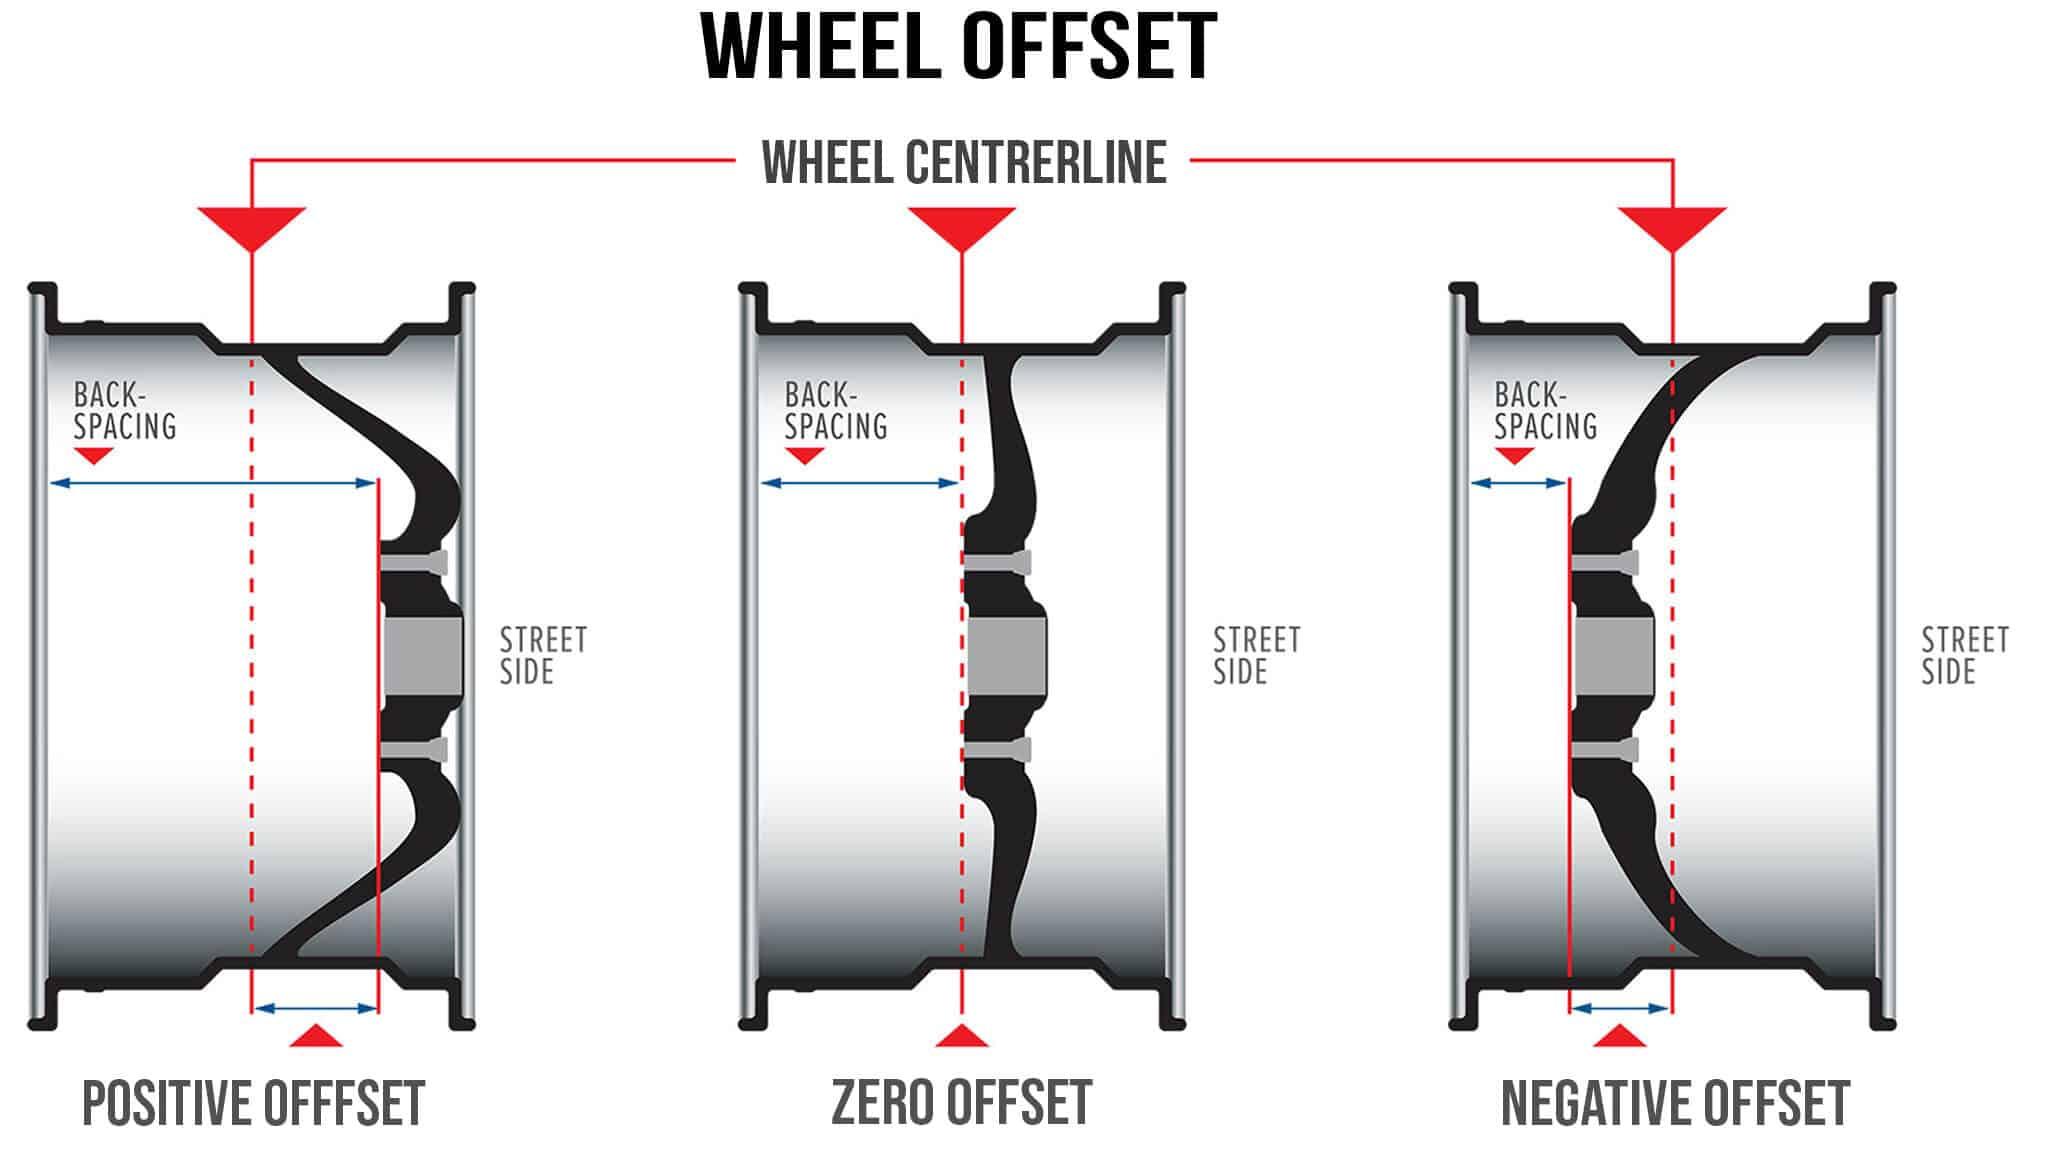 wheel offset positive zero negative